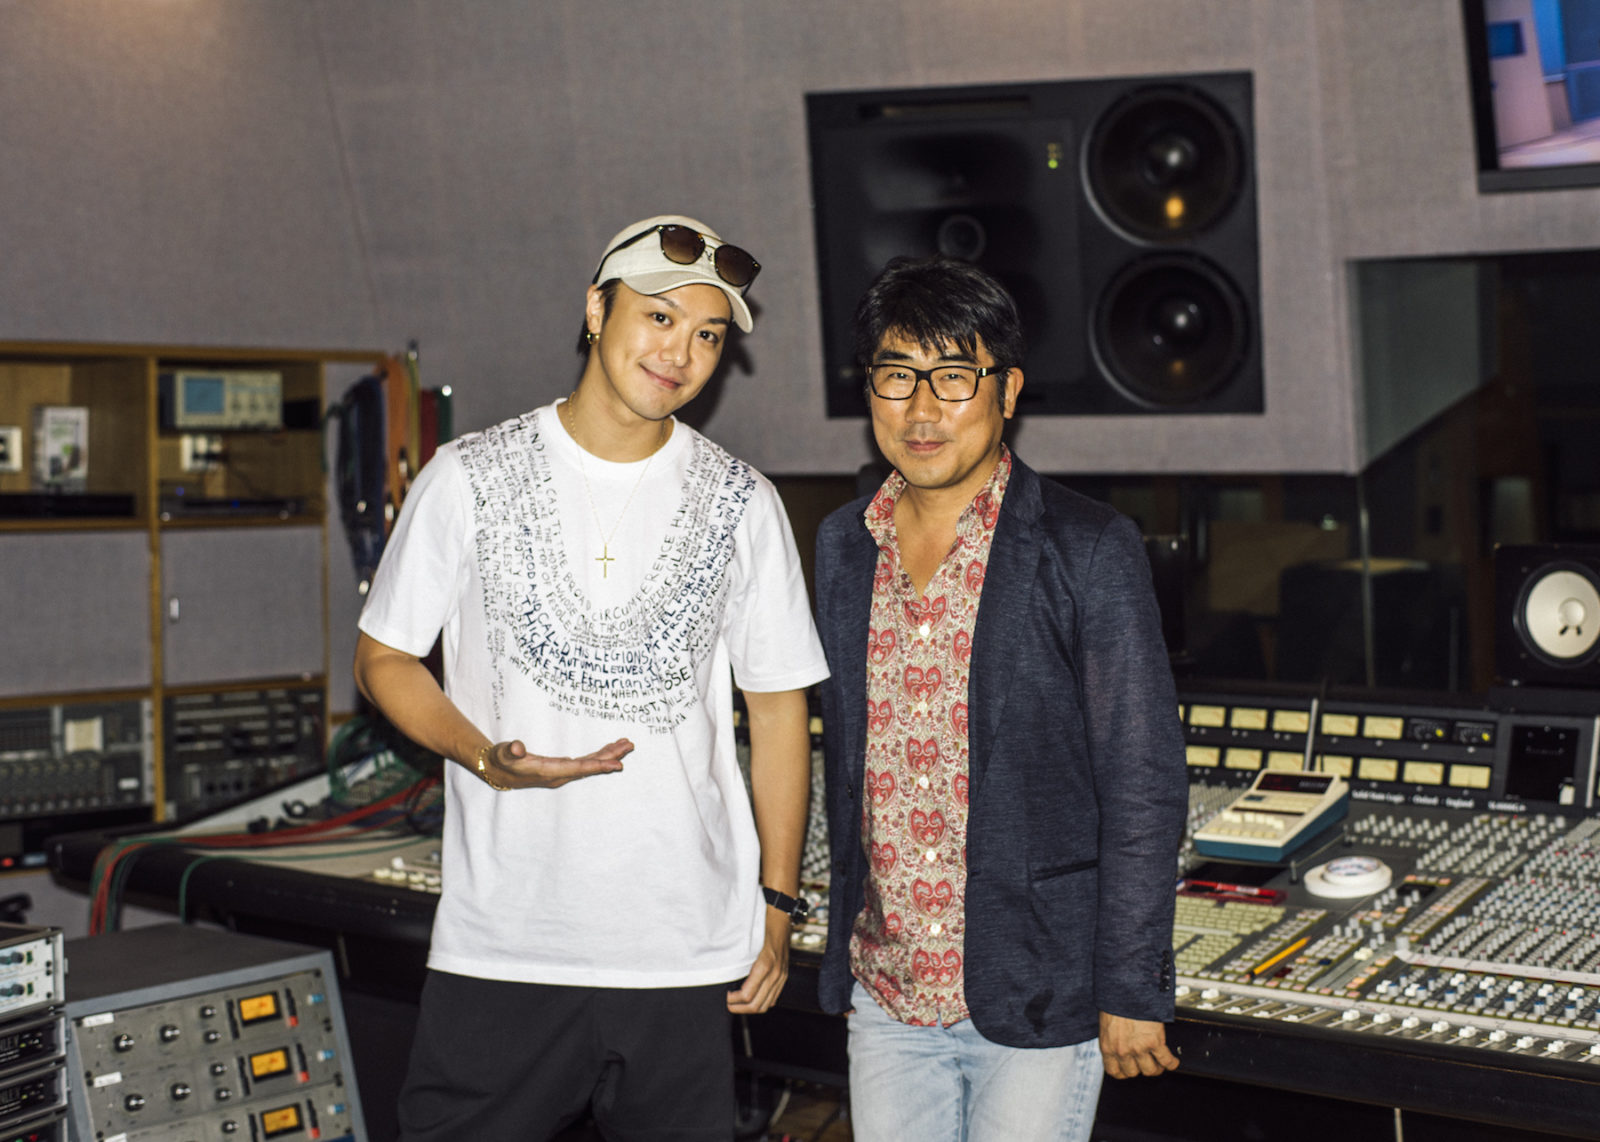 EXILE TAKAHIROソロとして2年ぶりとなるシングル「Eternal Love」を10月4日(水)にリリース決定サムネイル画像